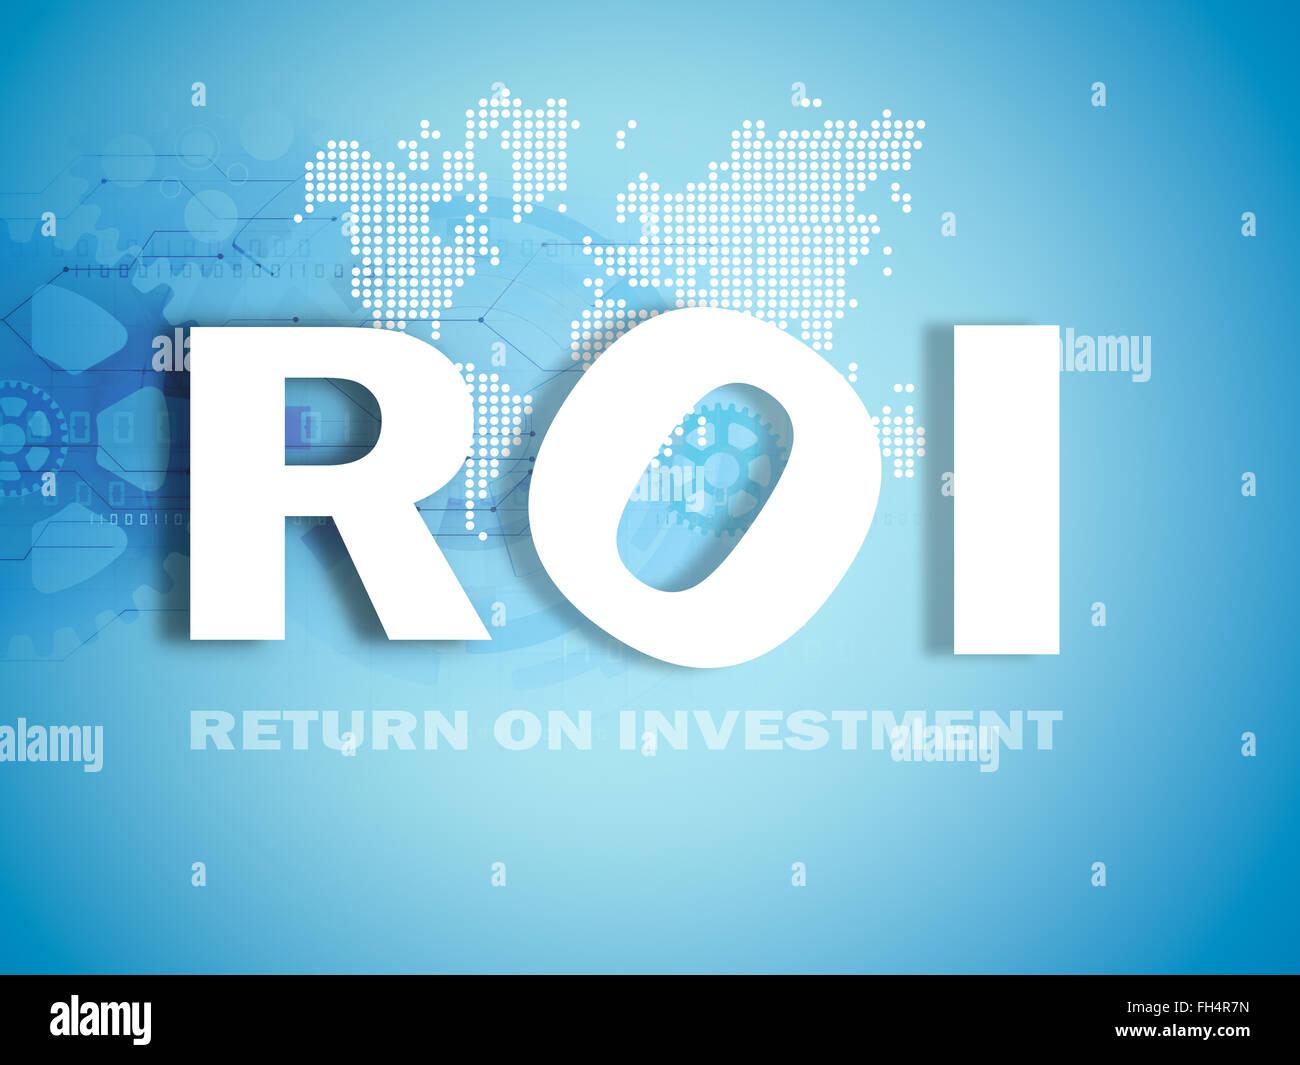 investment performance indicator - Stock Image